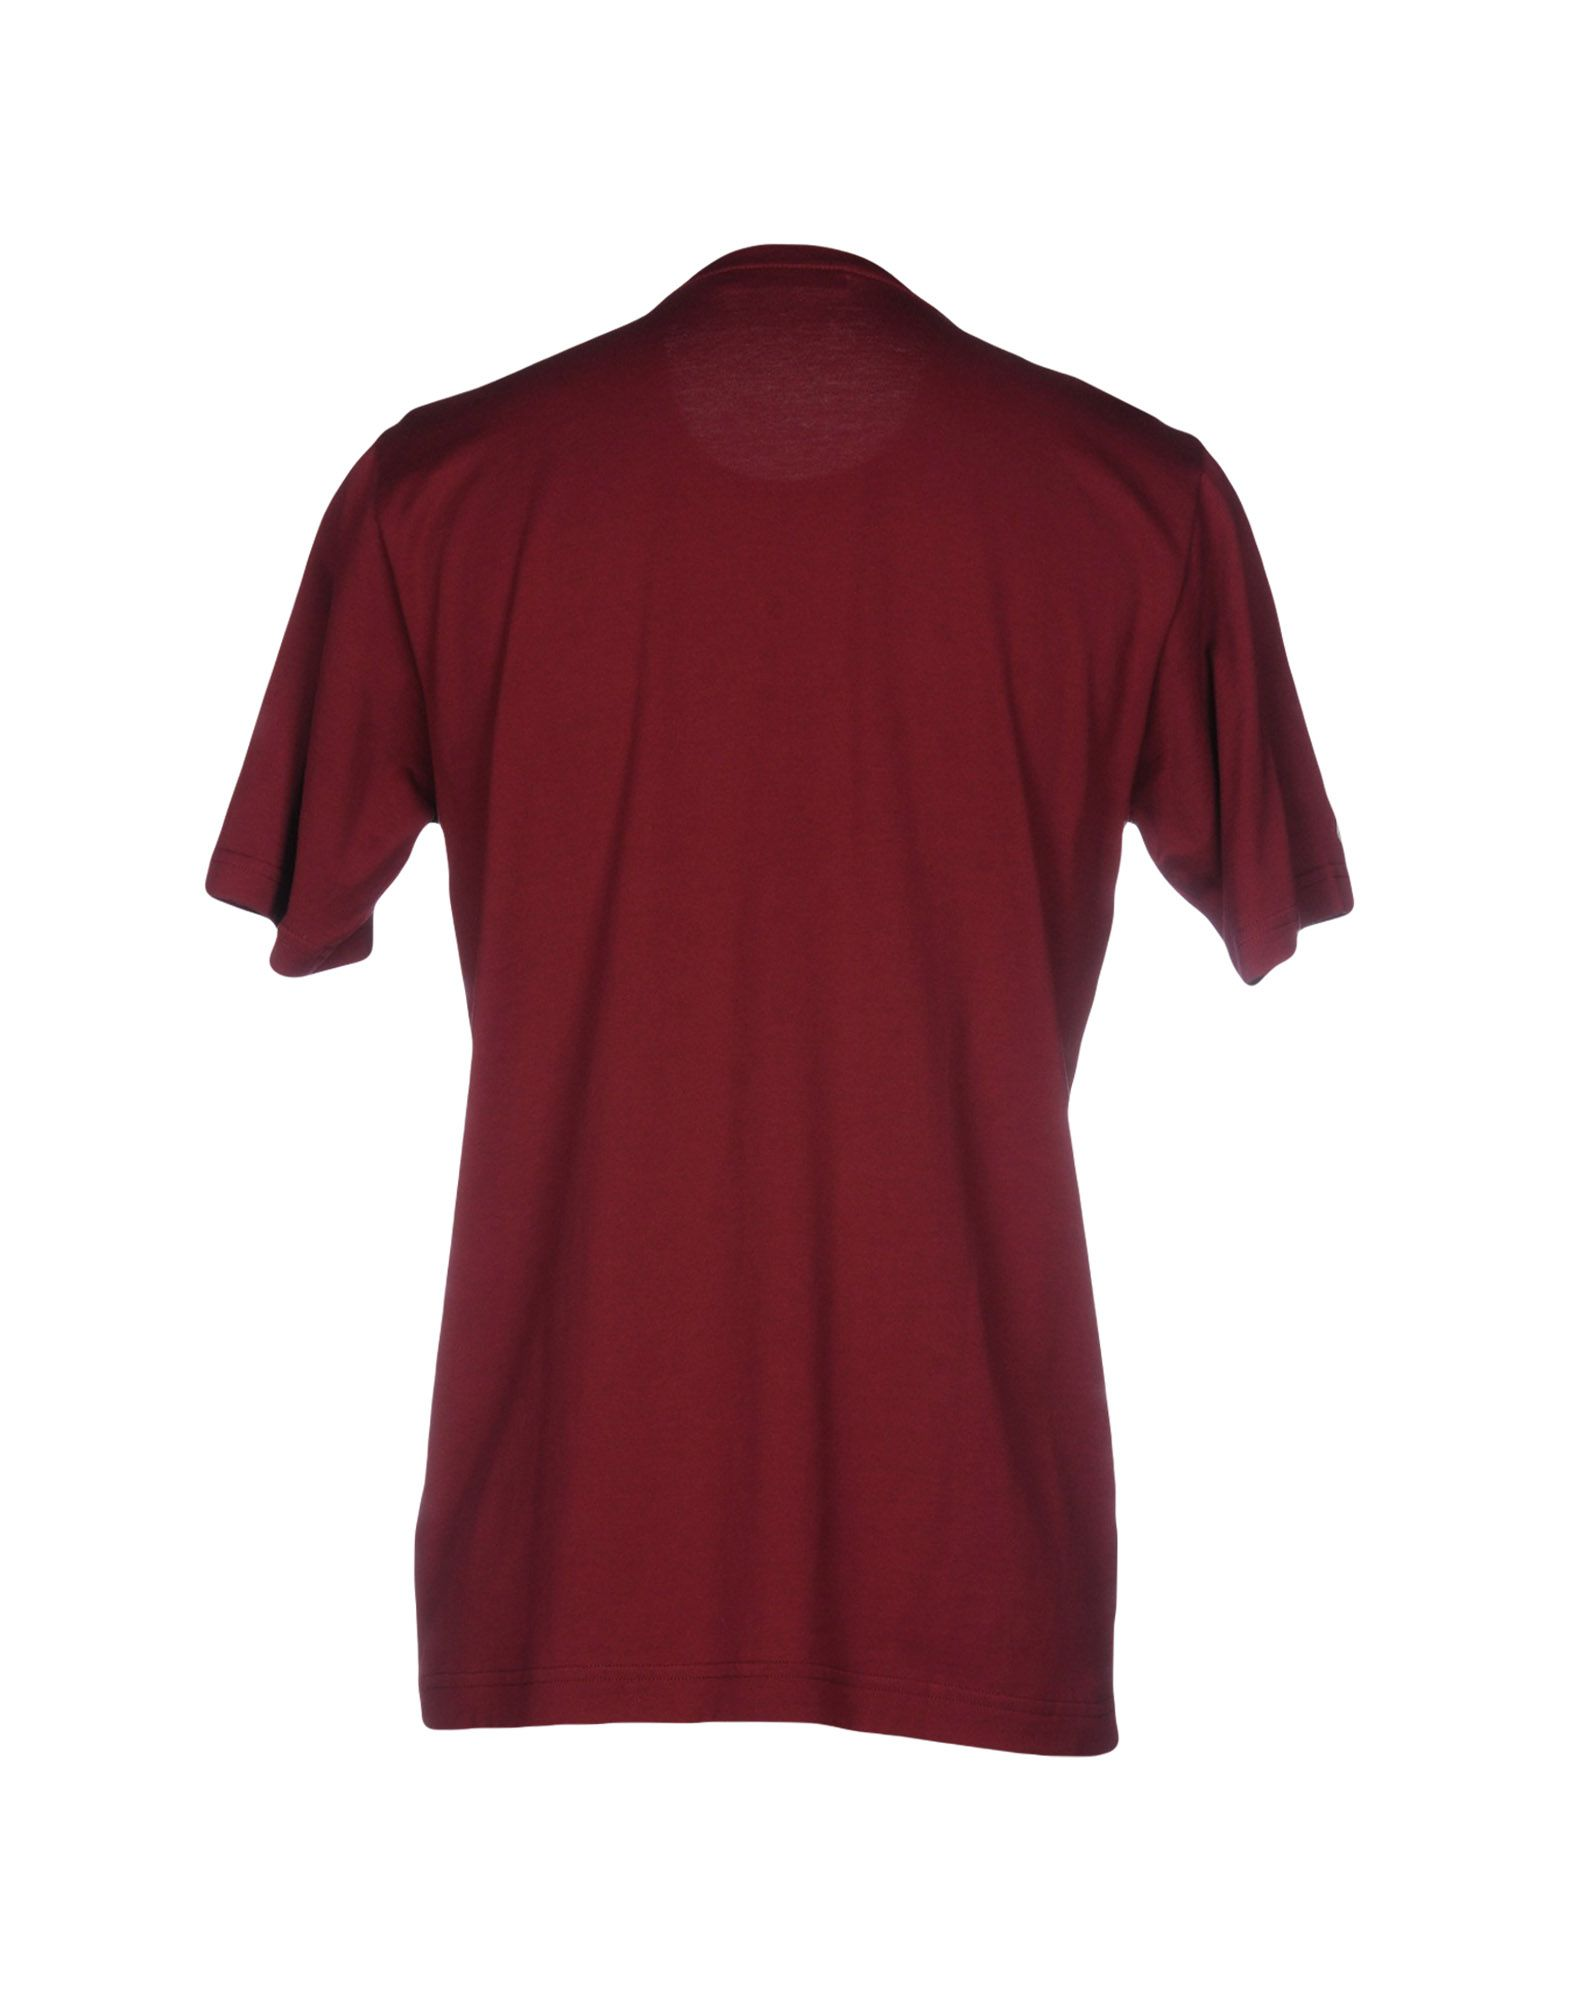 T-Shirt 37966691CU Dolce & Gabbana Uomo - 37966691CU T-Shirt 5ac9c8